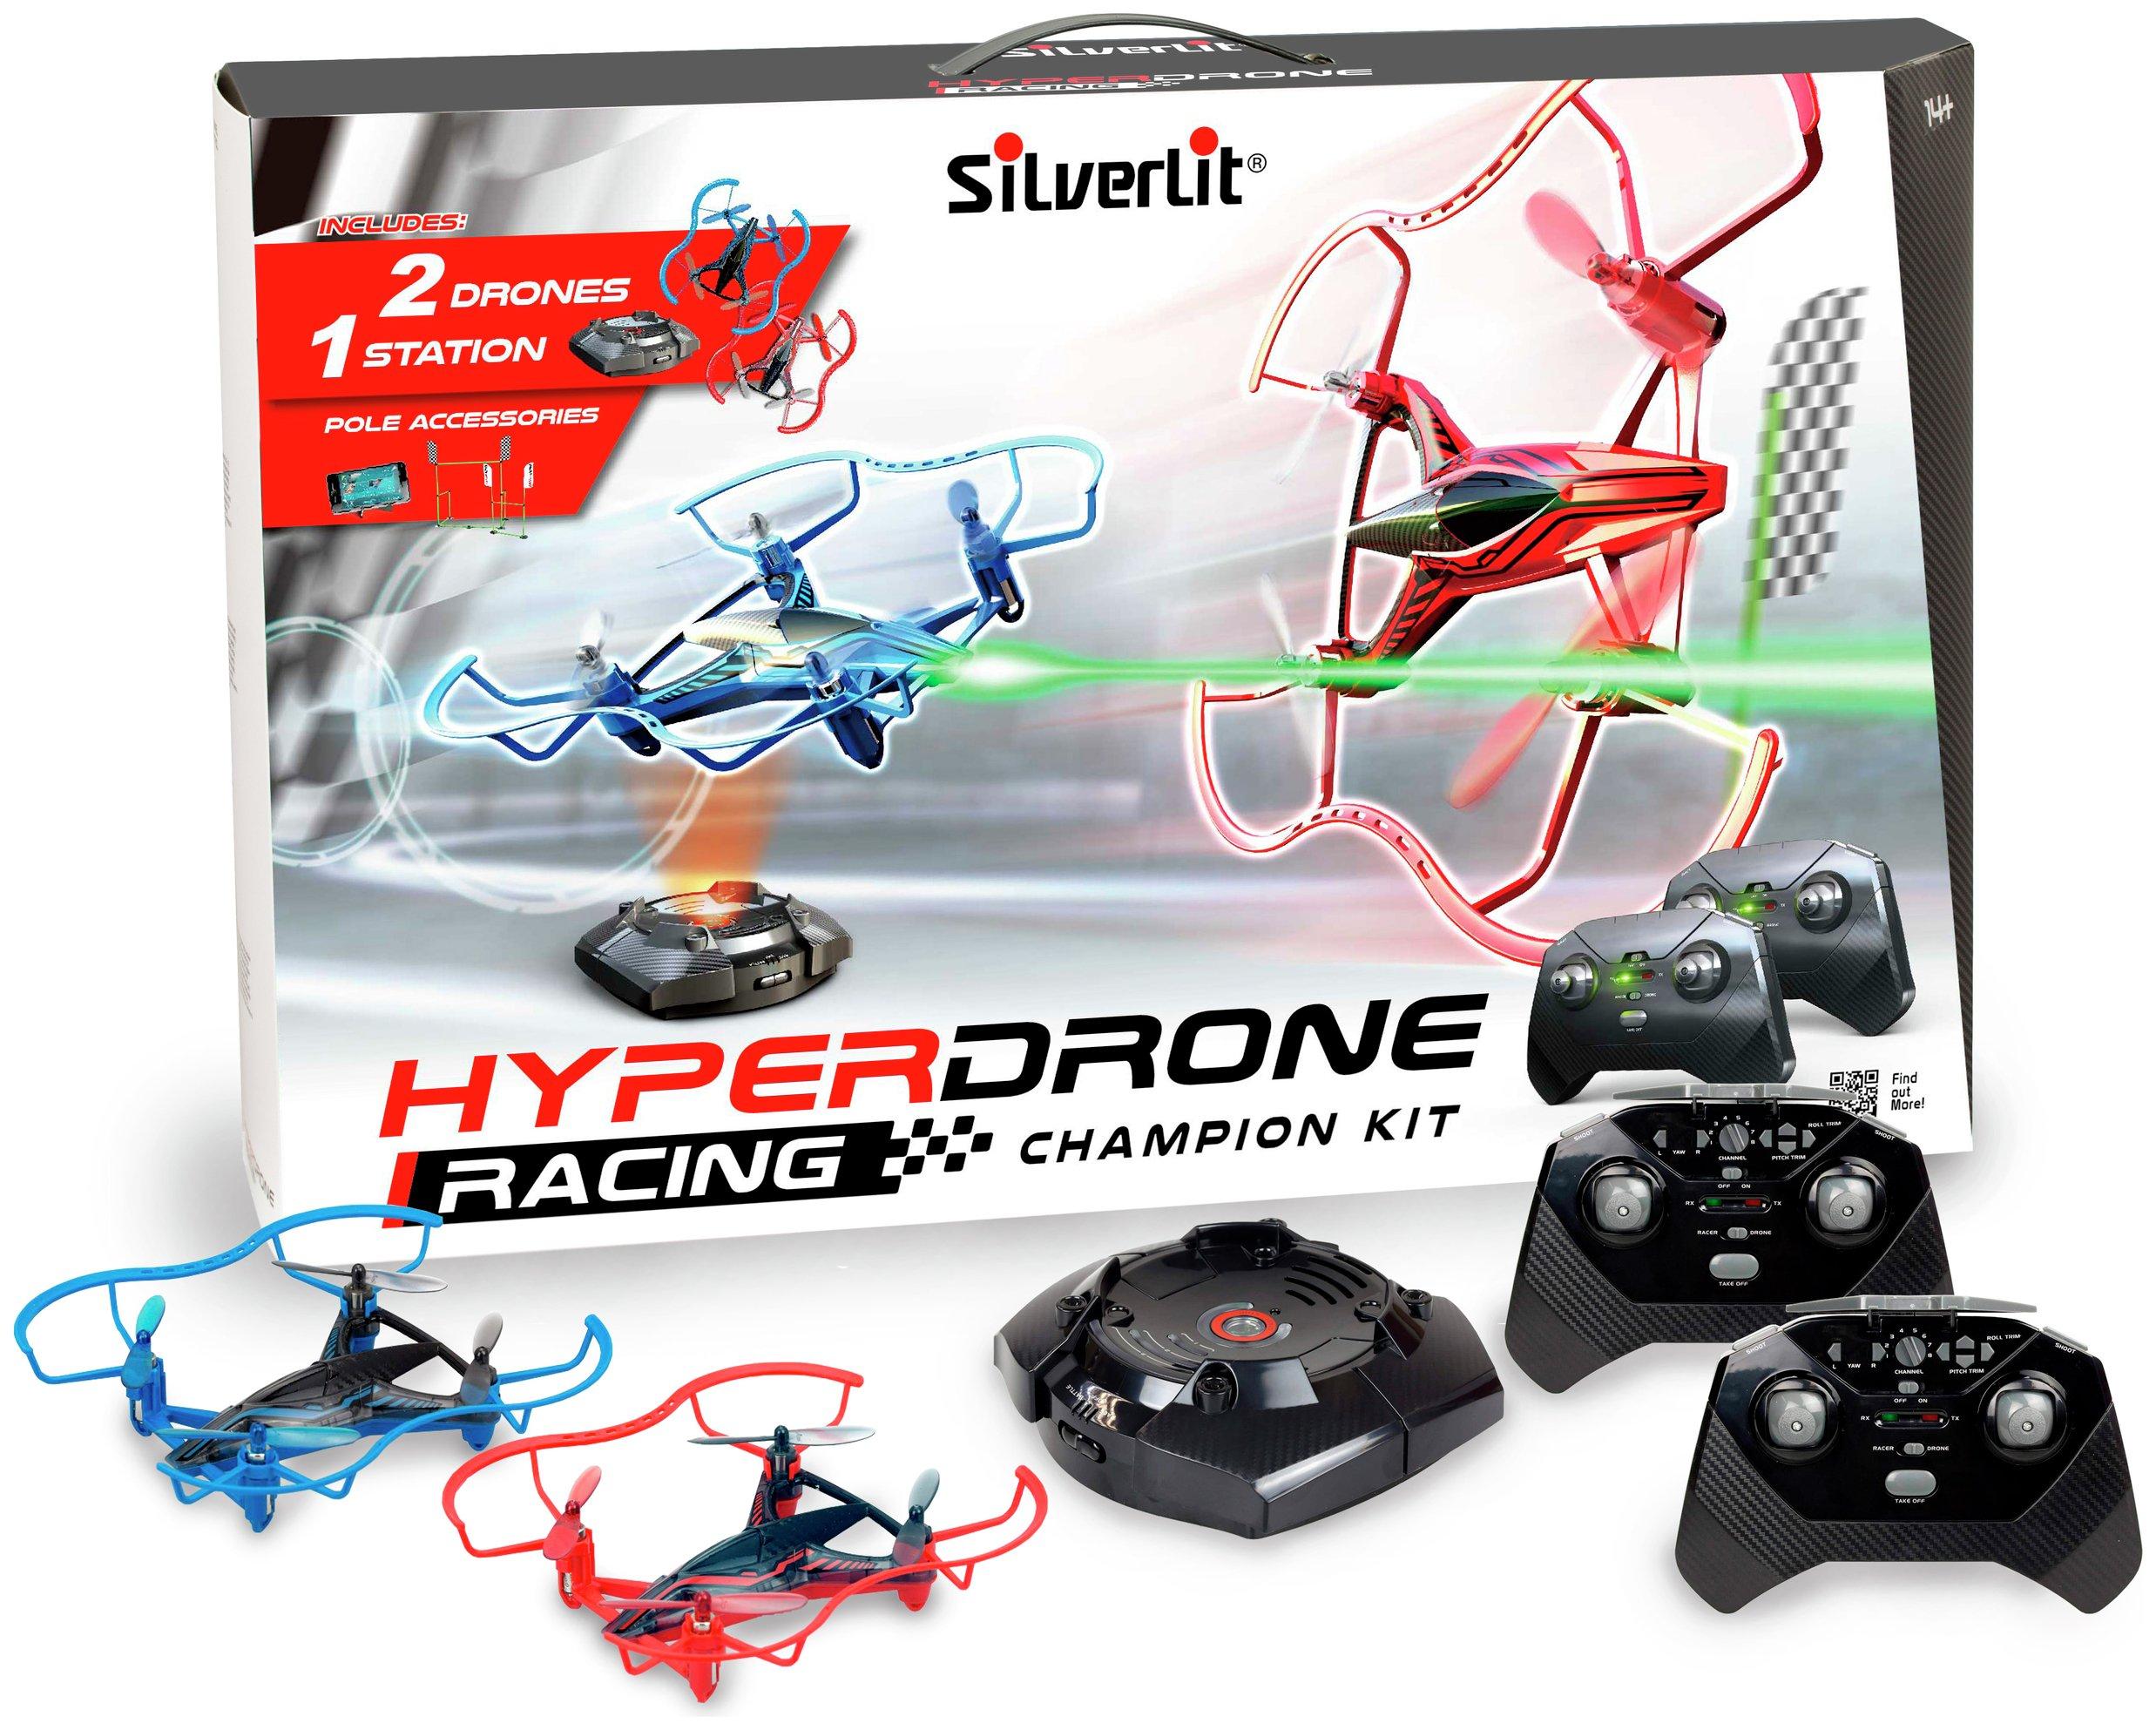 Silverlit 2.4G Hyperdrone Racing Kit